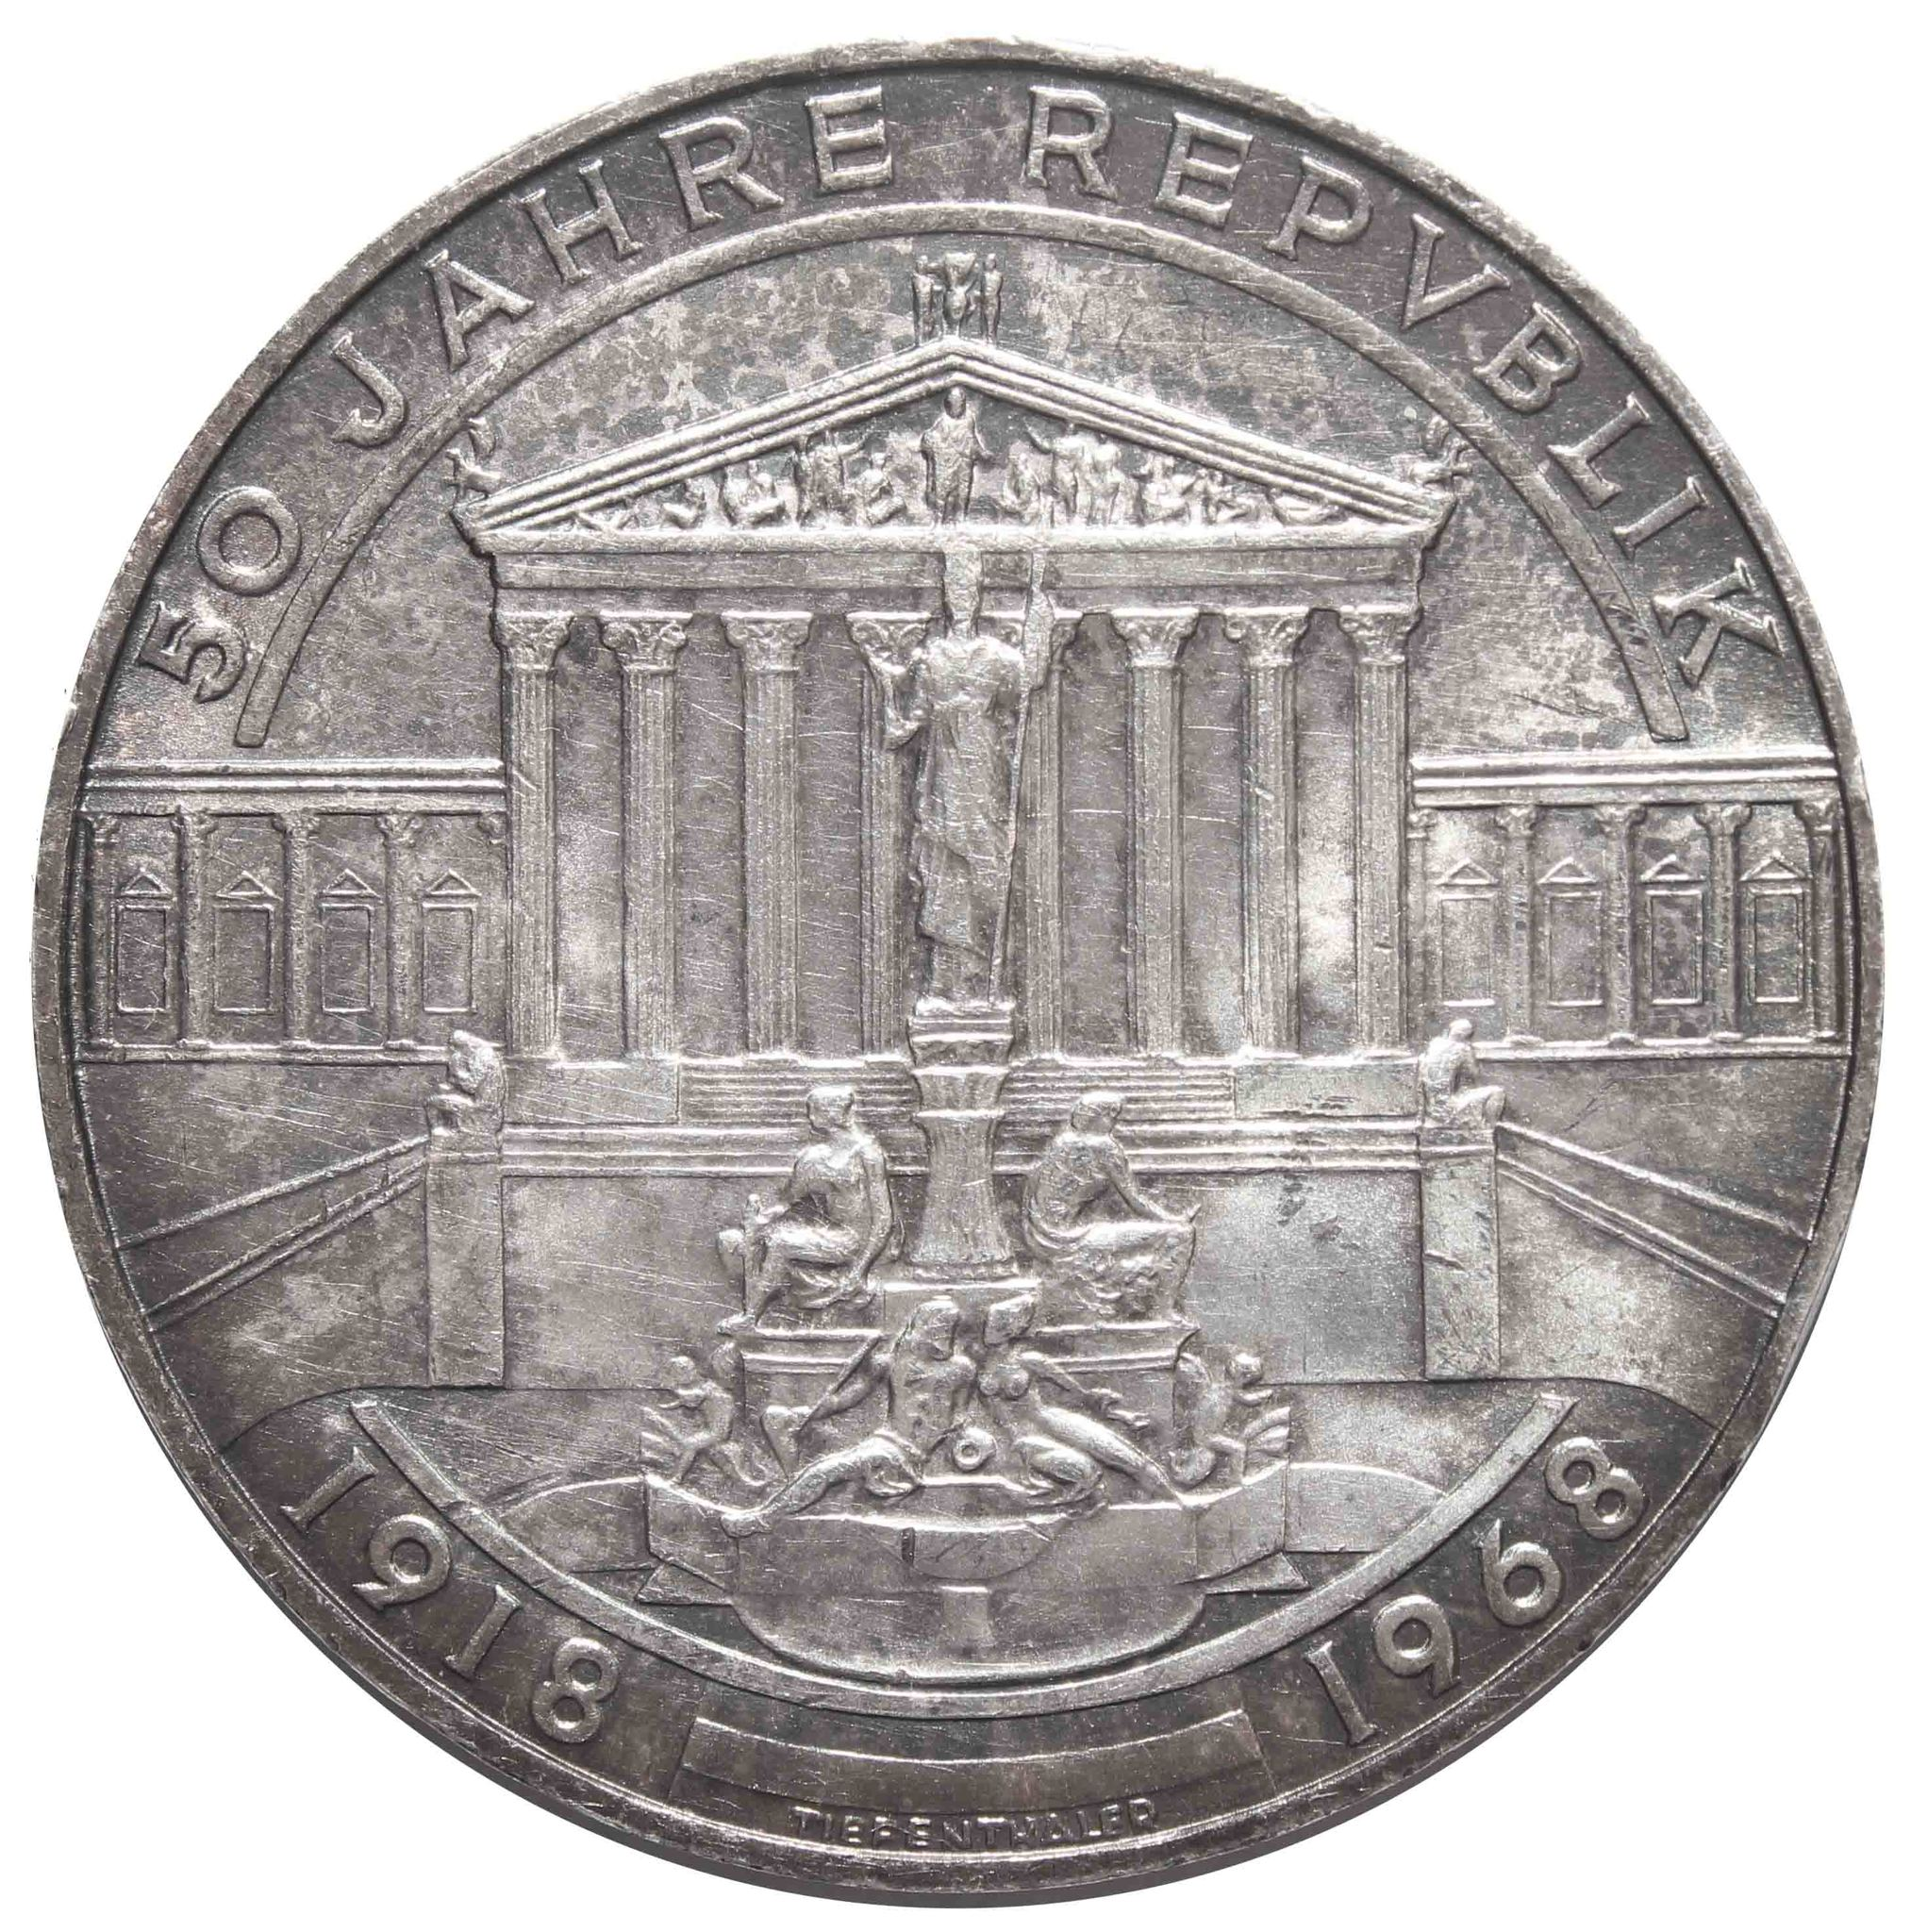 50 шиллингов. 50 лет Республике - Здание парламента в Вене. Австрия. 1968 год. Серебро. XF-AU